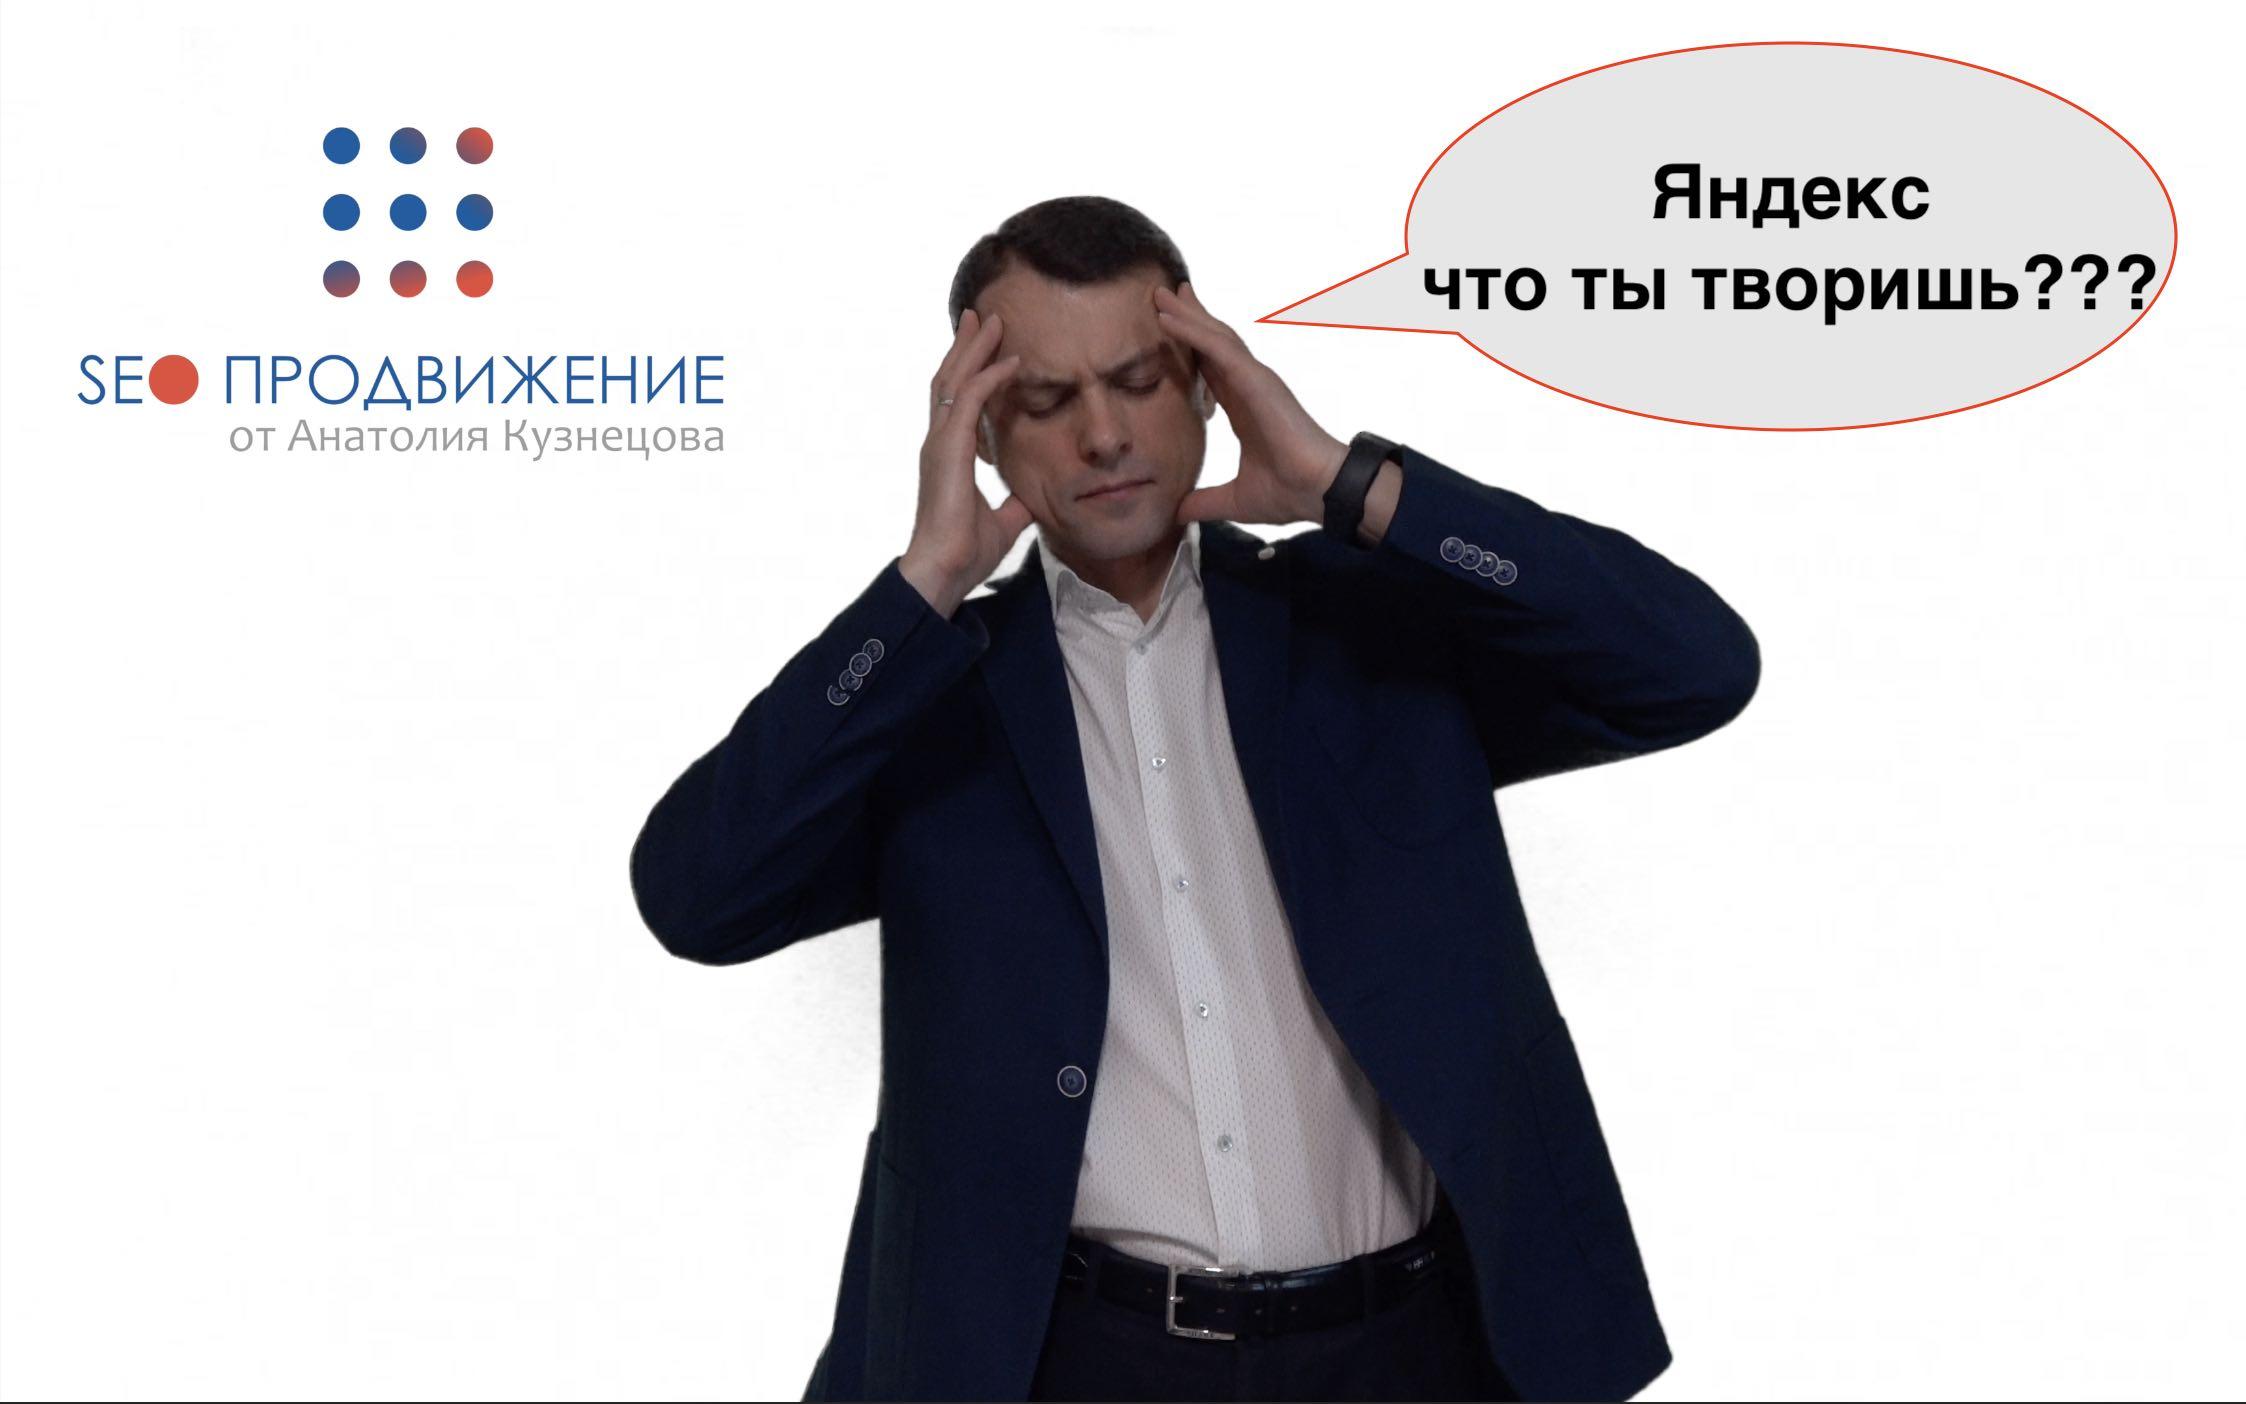 Бан за накрутку поведенческих | Яндекс загнал себя в ловушку